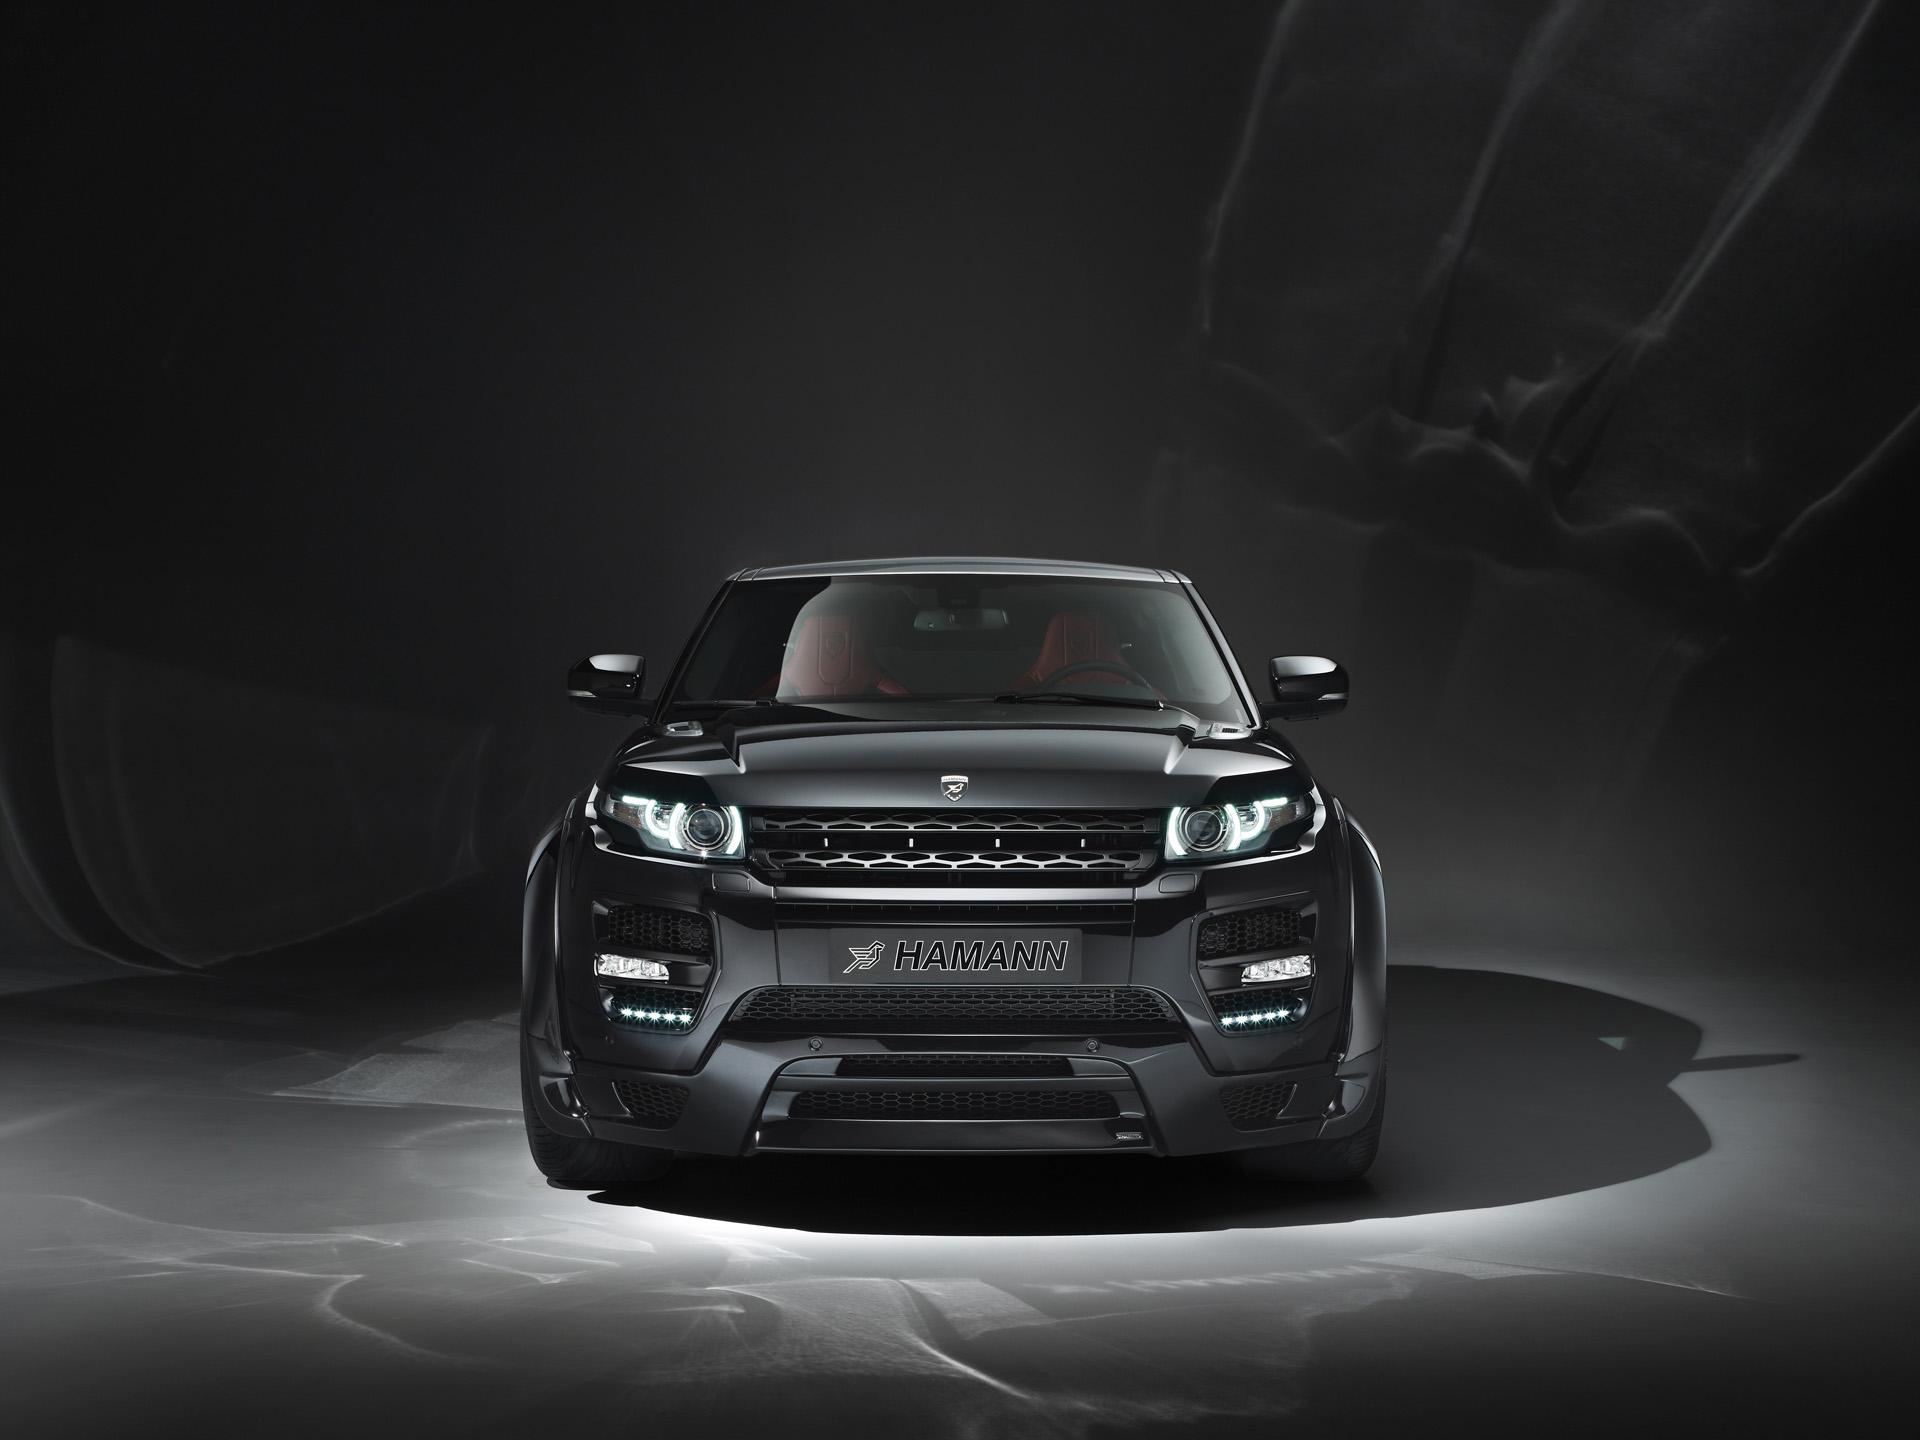 latest model range rover wallpapers